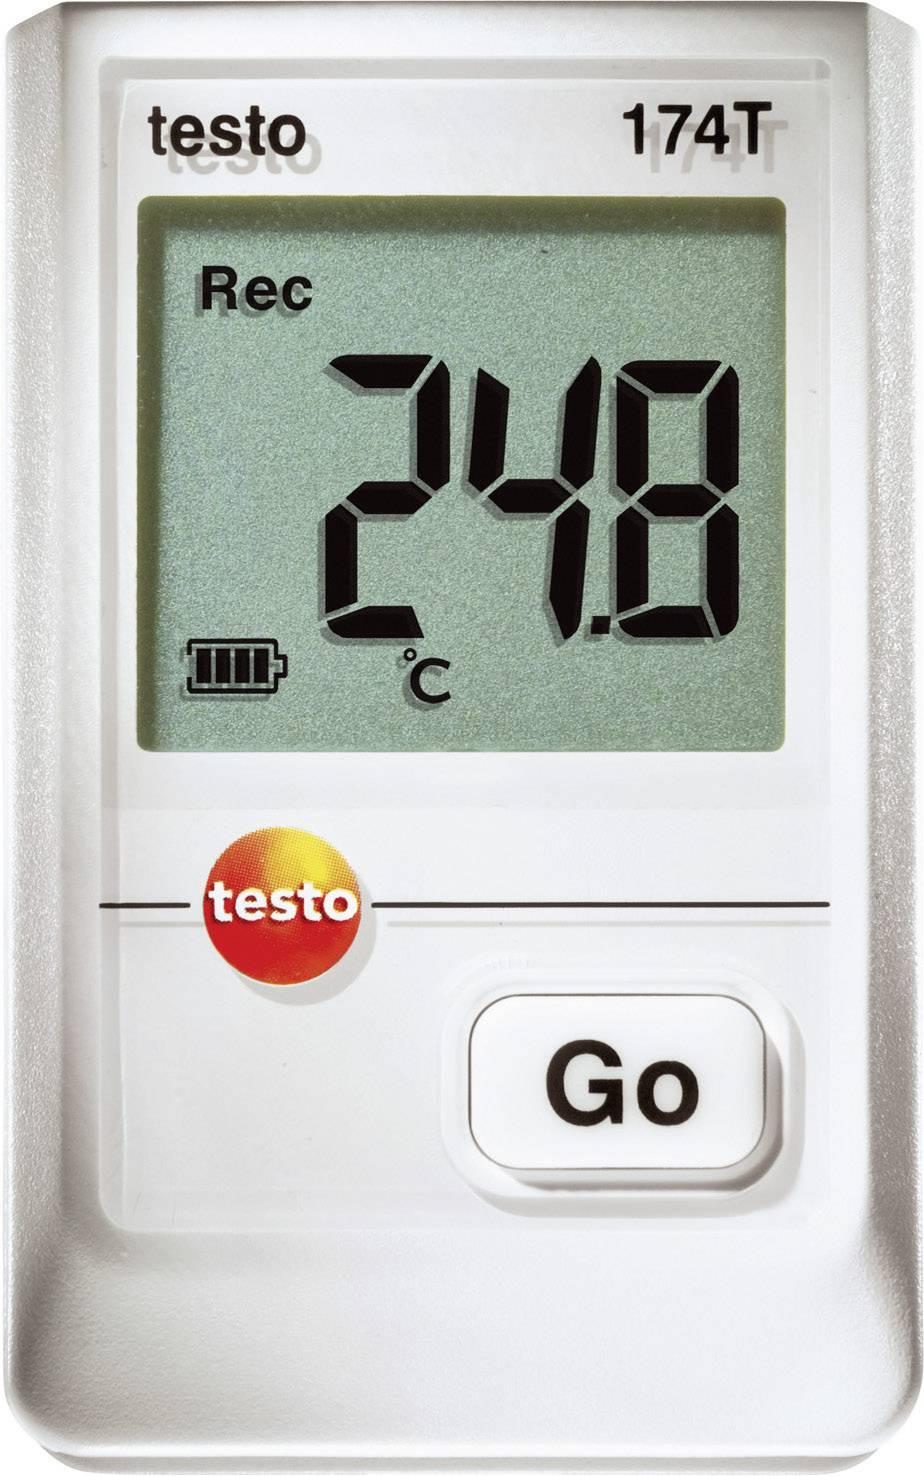 Teplotný datalogger testo 174T, -30 až +70 °C